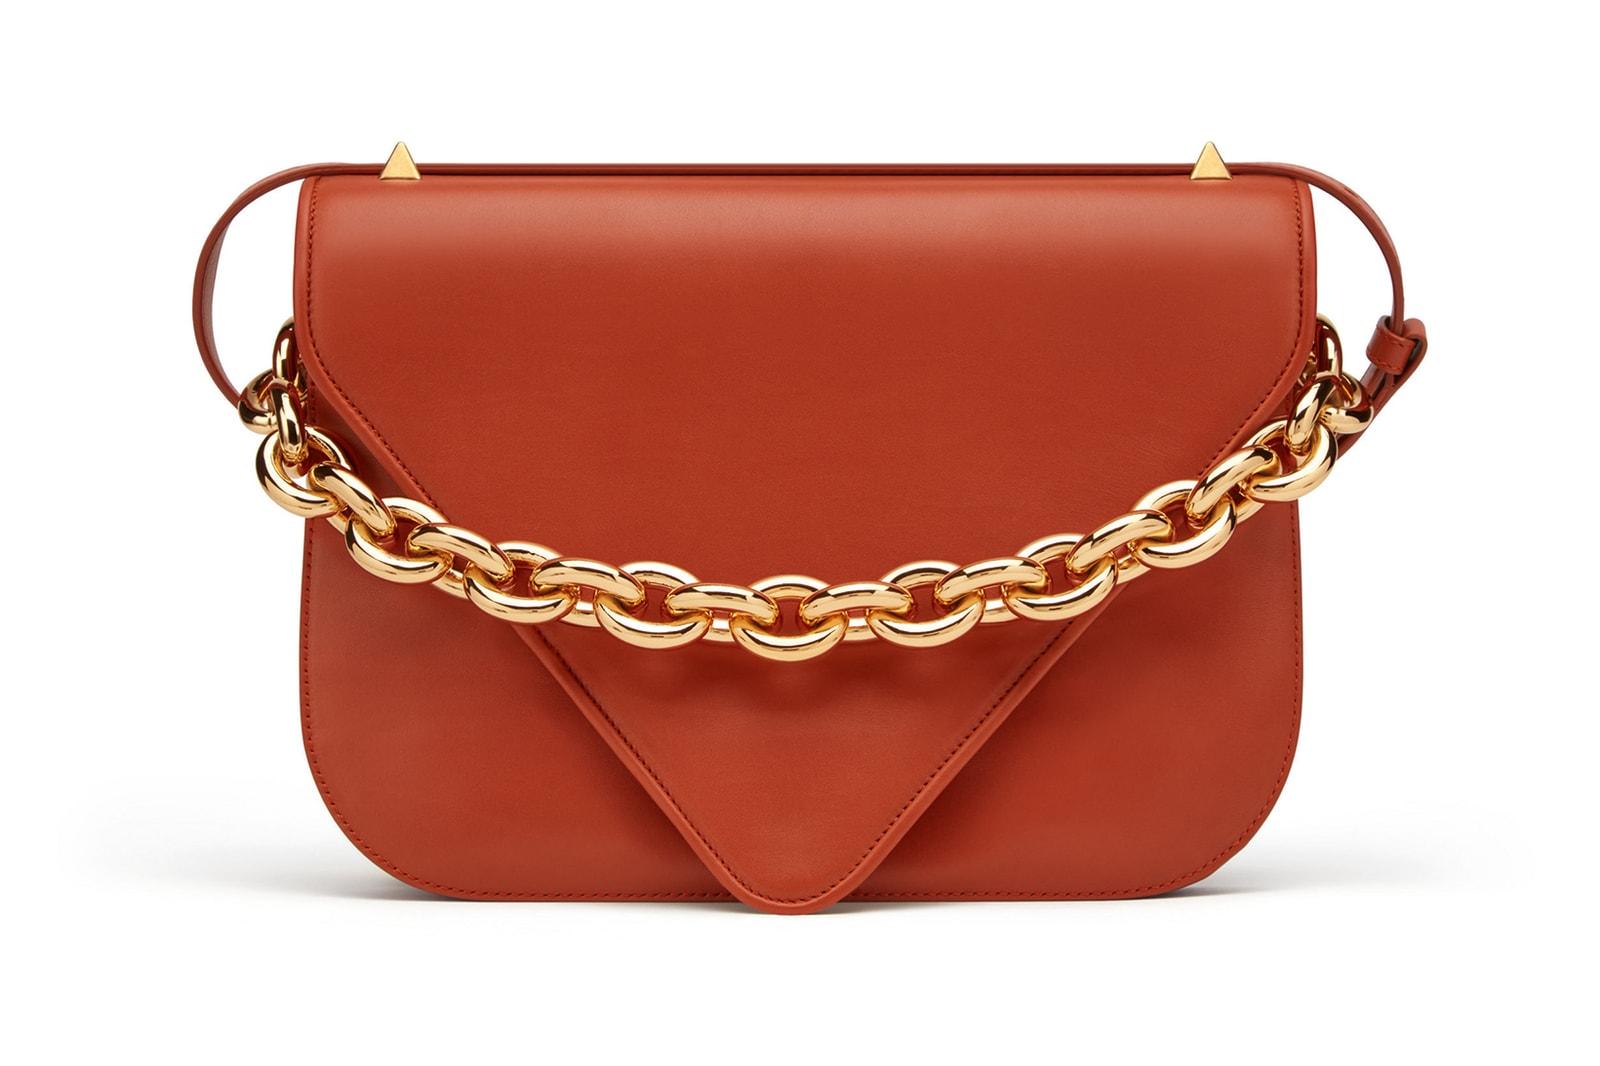 Bottega Veneta Mount Bag Accessory Envelope Crossbody Bermuda Top Handle